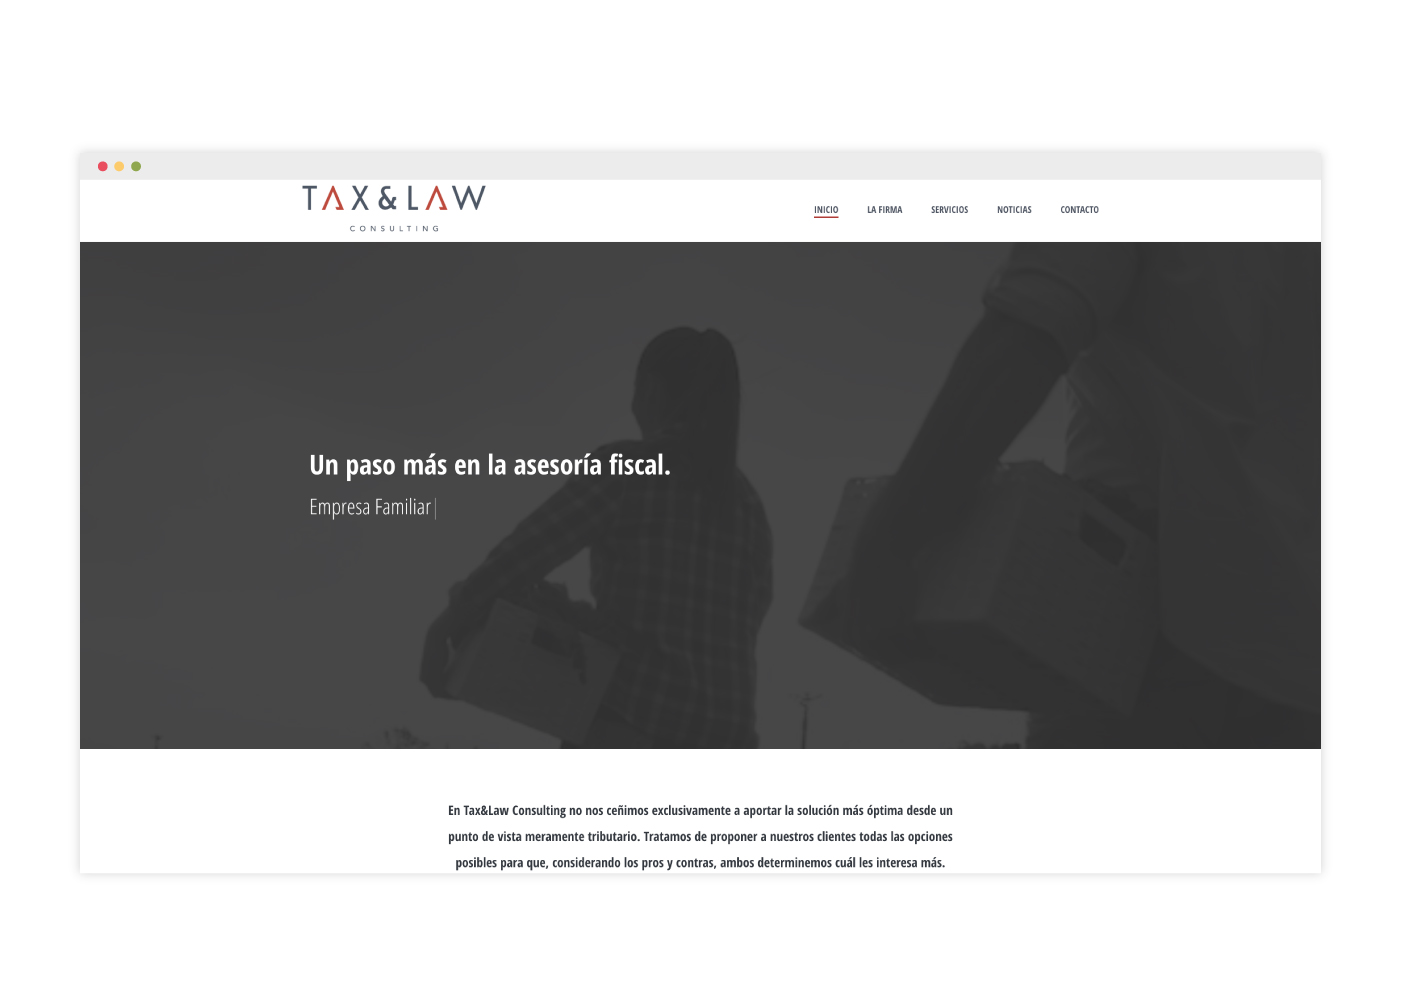 diseno-programacion-web-abogados-malaga-tax-law-1